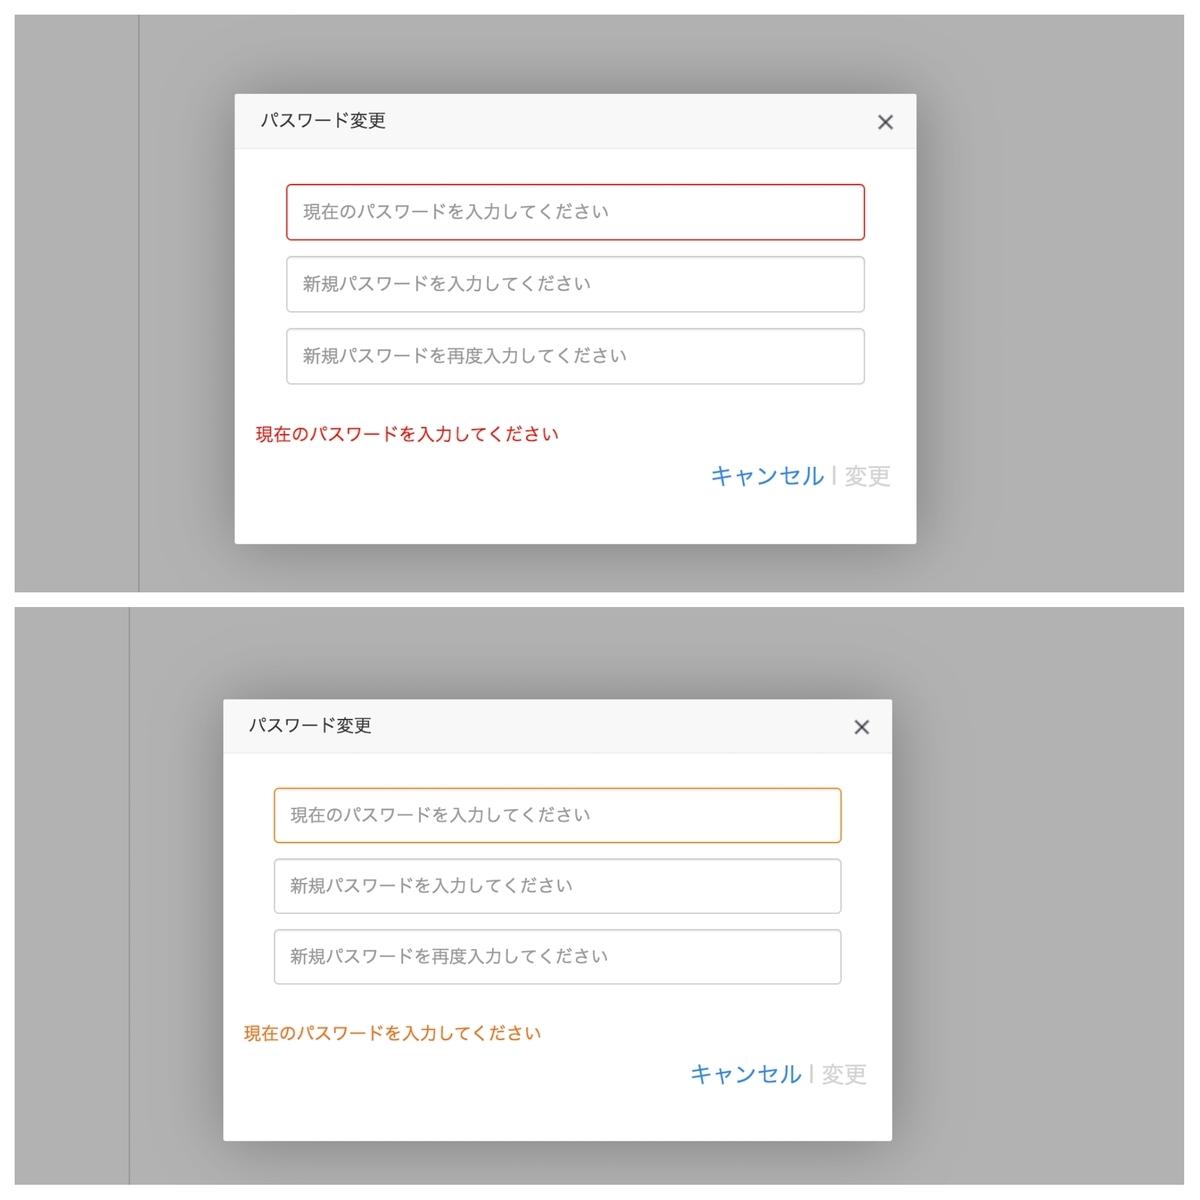 f:id:yamamoto5555:20200311094711j:plain